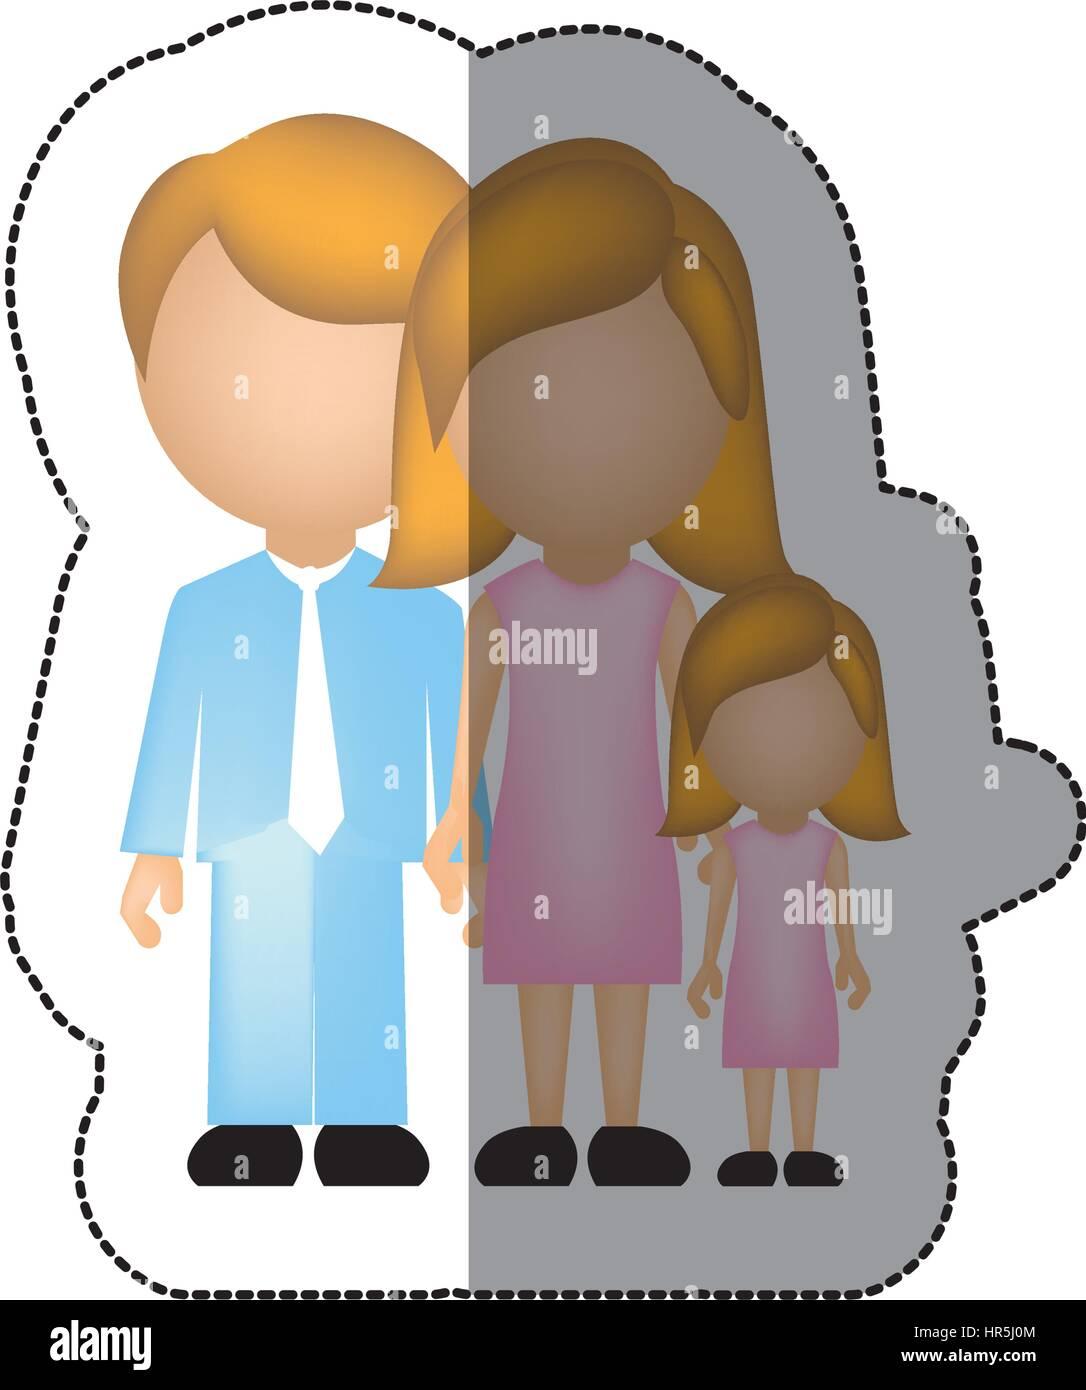 nuclear family cartoon stock vector images alamy